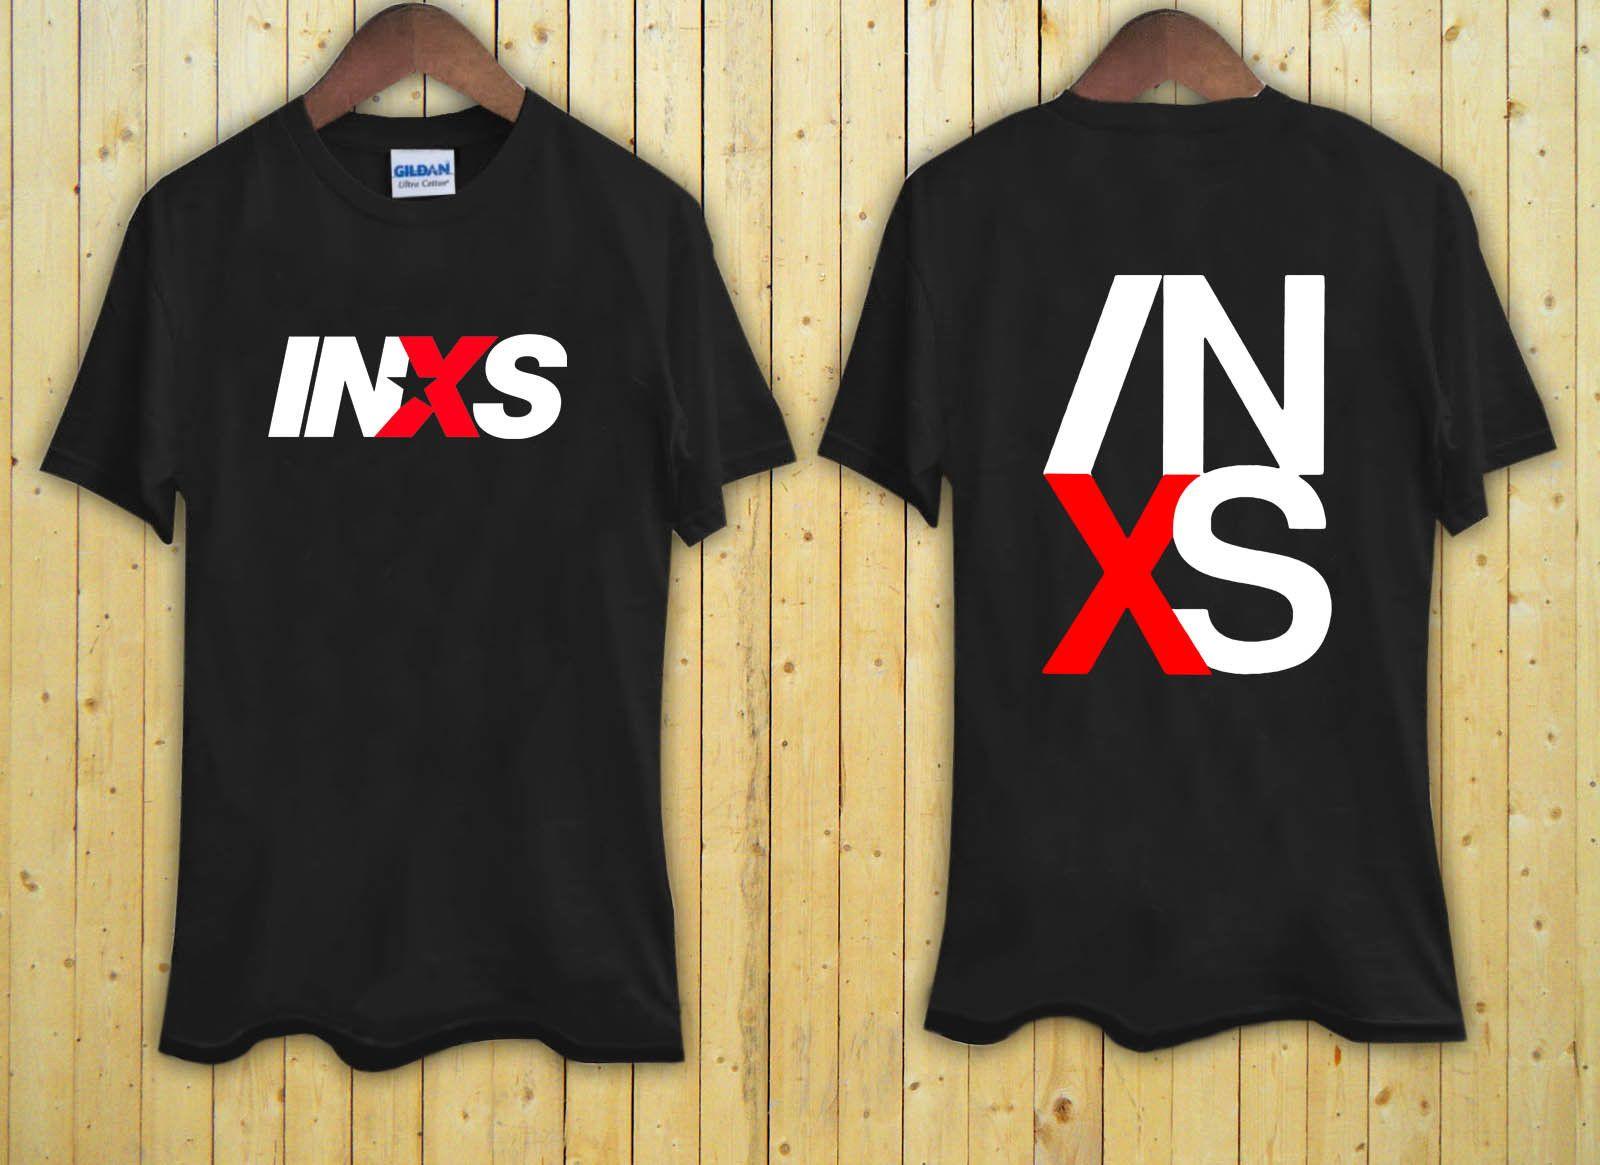 732eb9b939a INXS Australian Rock Band Legend Logo Black T Shirt XS S M L XL 2XL 3XL Men  Women Unisex Fashion Tshirt Funny T Shirts Online Hilarious T Shirts From  ...